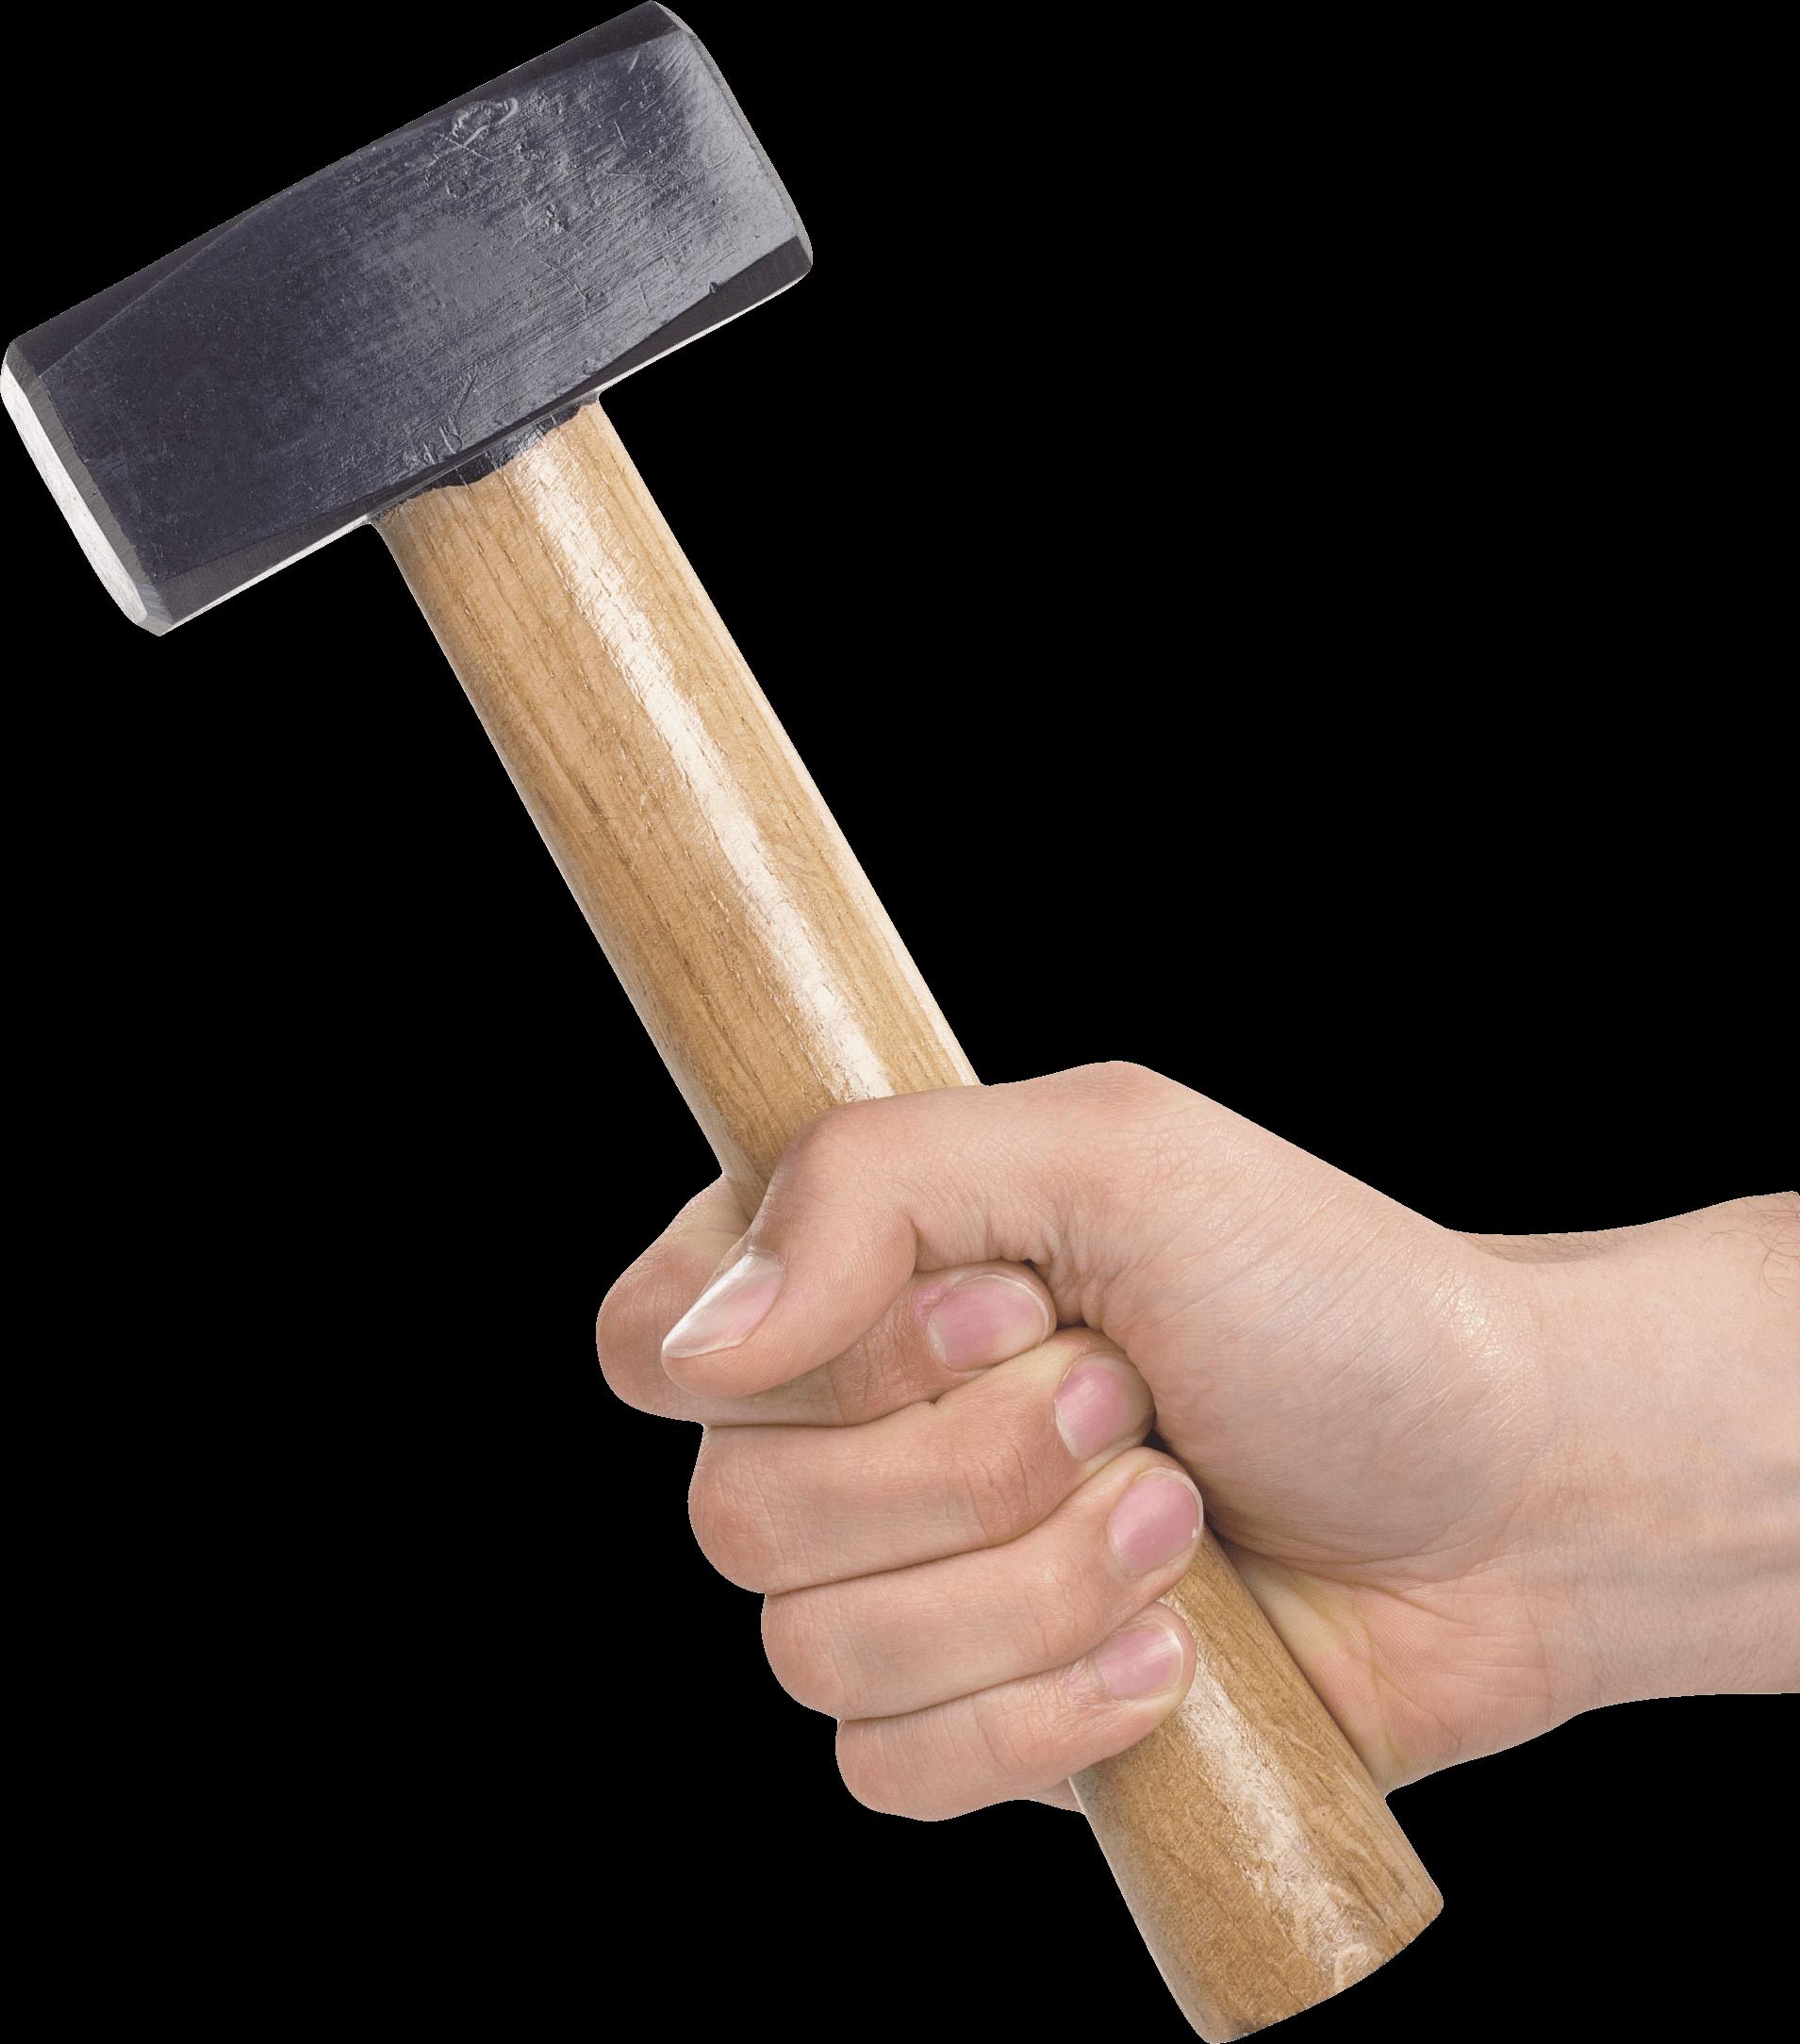 Hammer clipart hand holding. Transparent png stickpng sledge